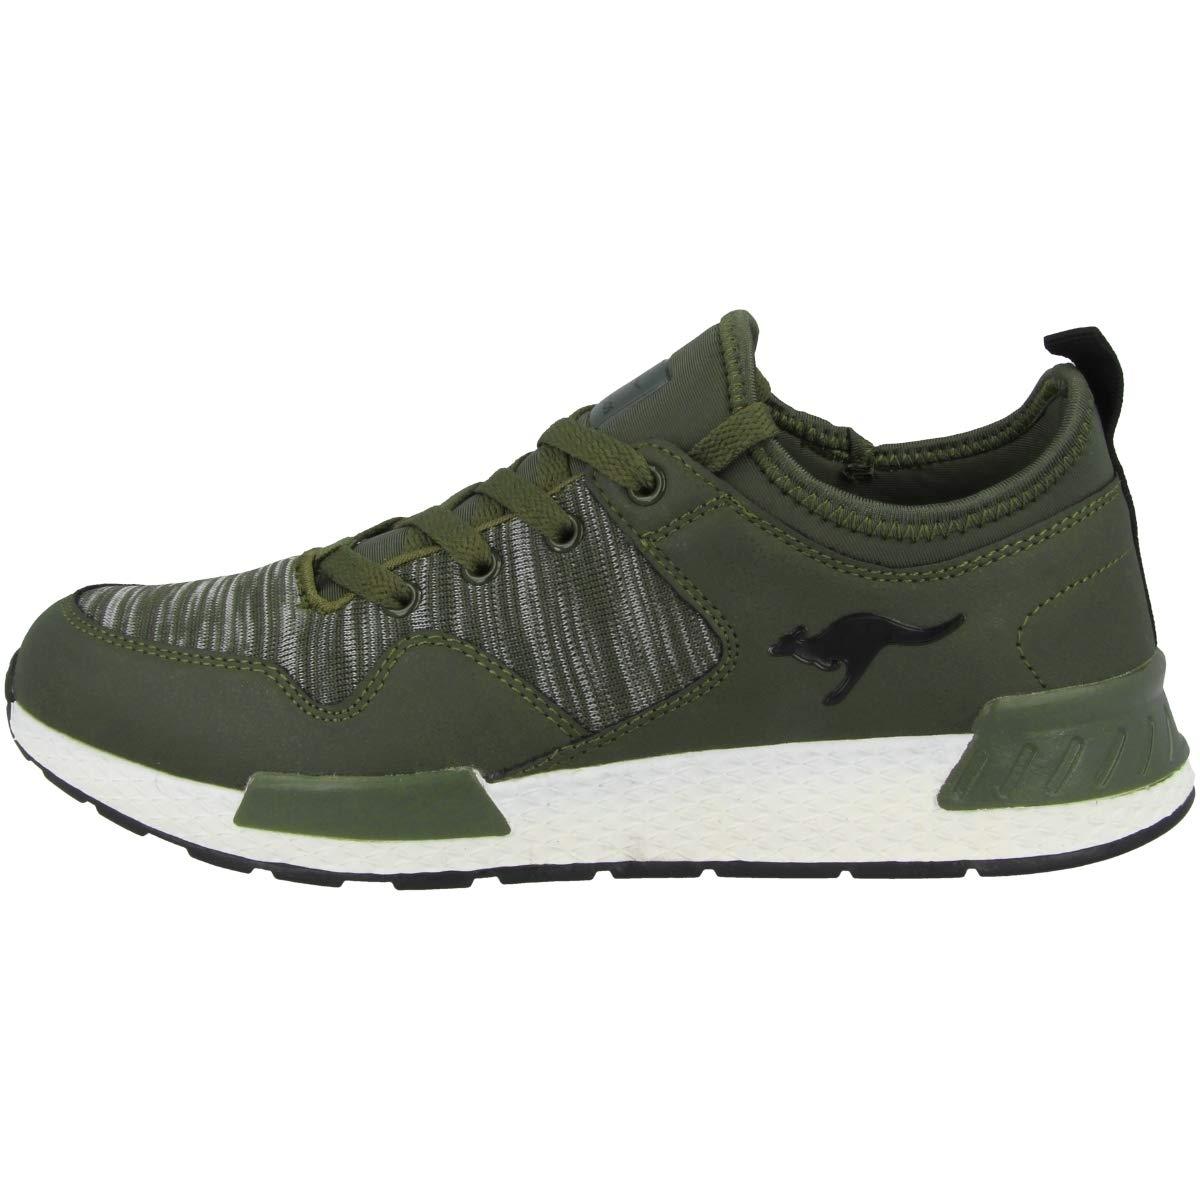 KangaROOS Damen W-750 Sneaker schwarz) Grün (Khaki/Jet schwarz) Sneaker 19f2ab